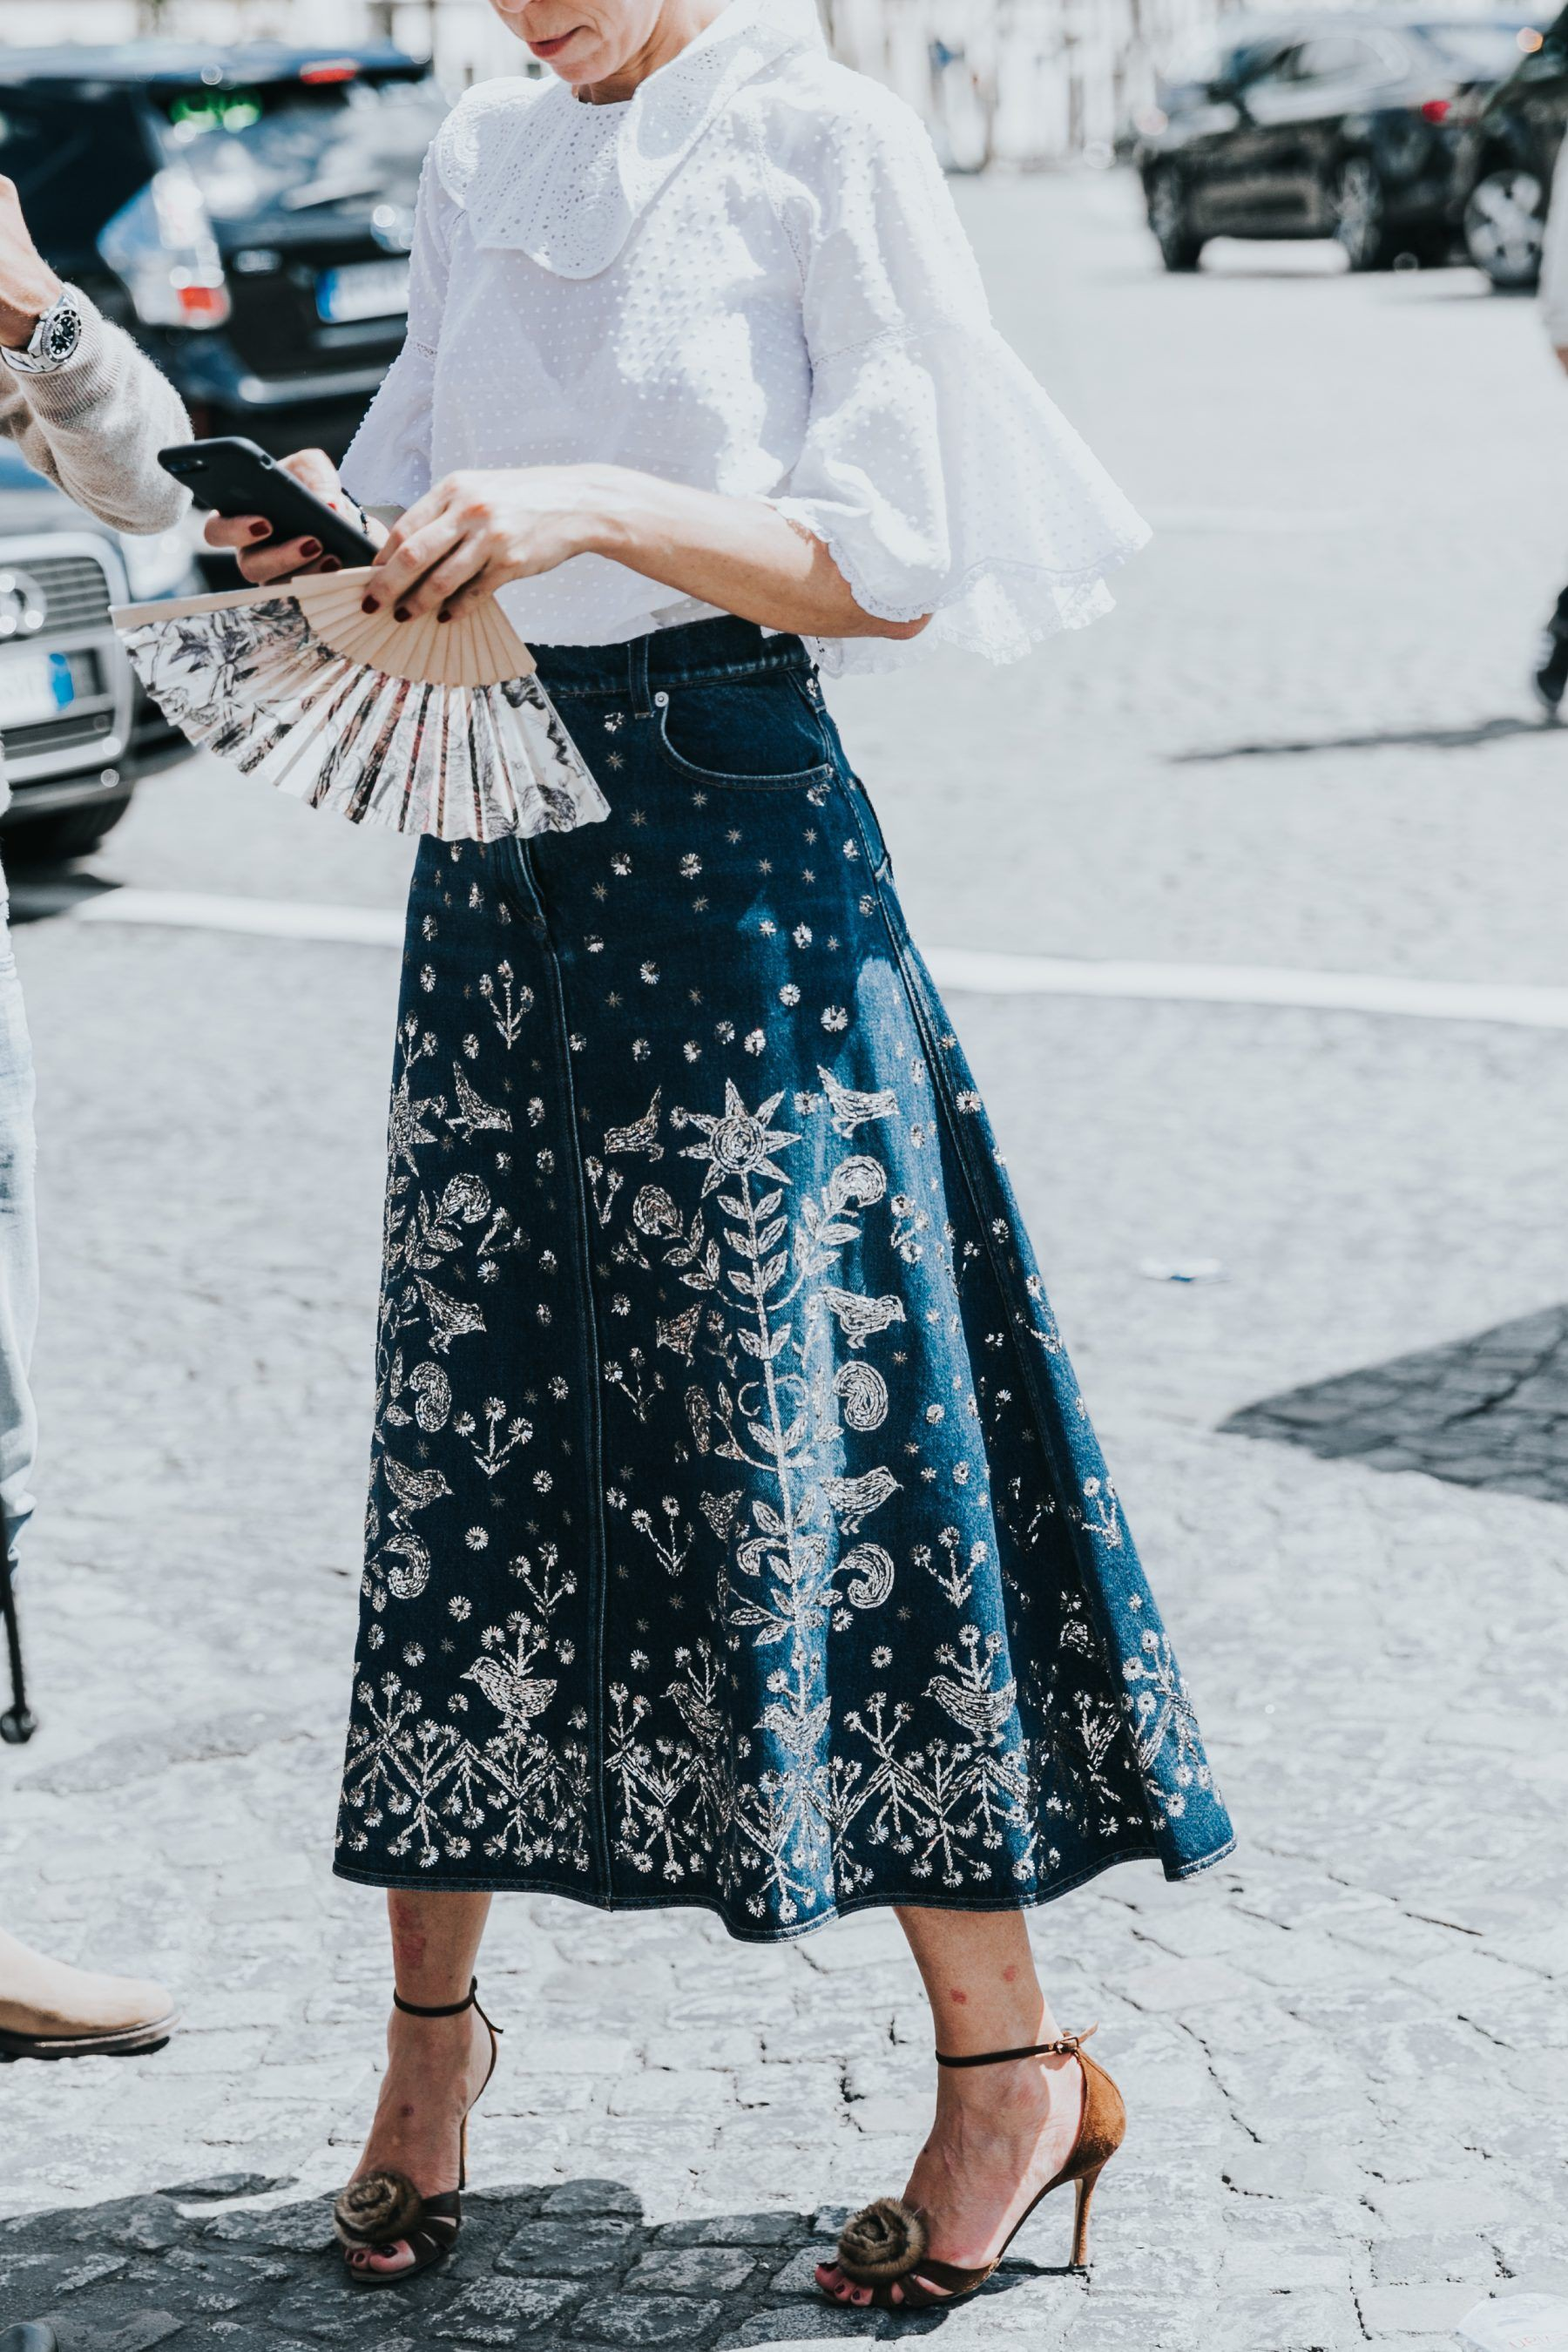 Paris street fashion july 2017 paris fashion week, street fashion